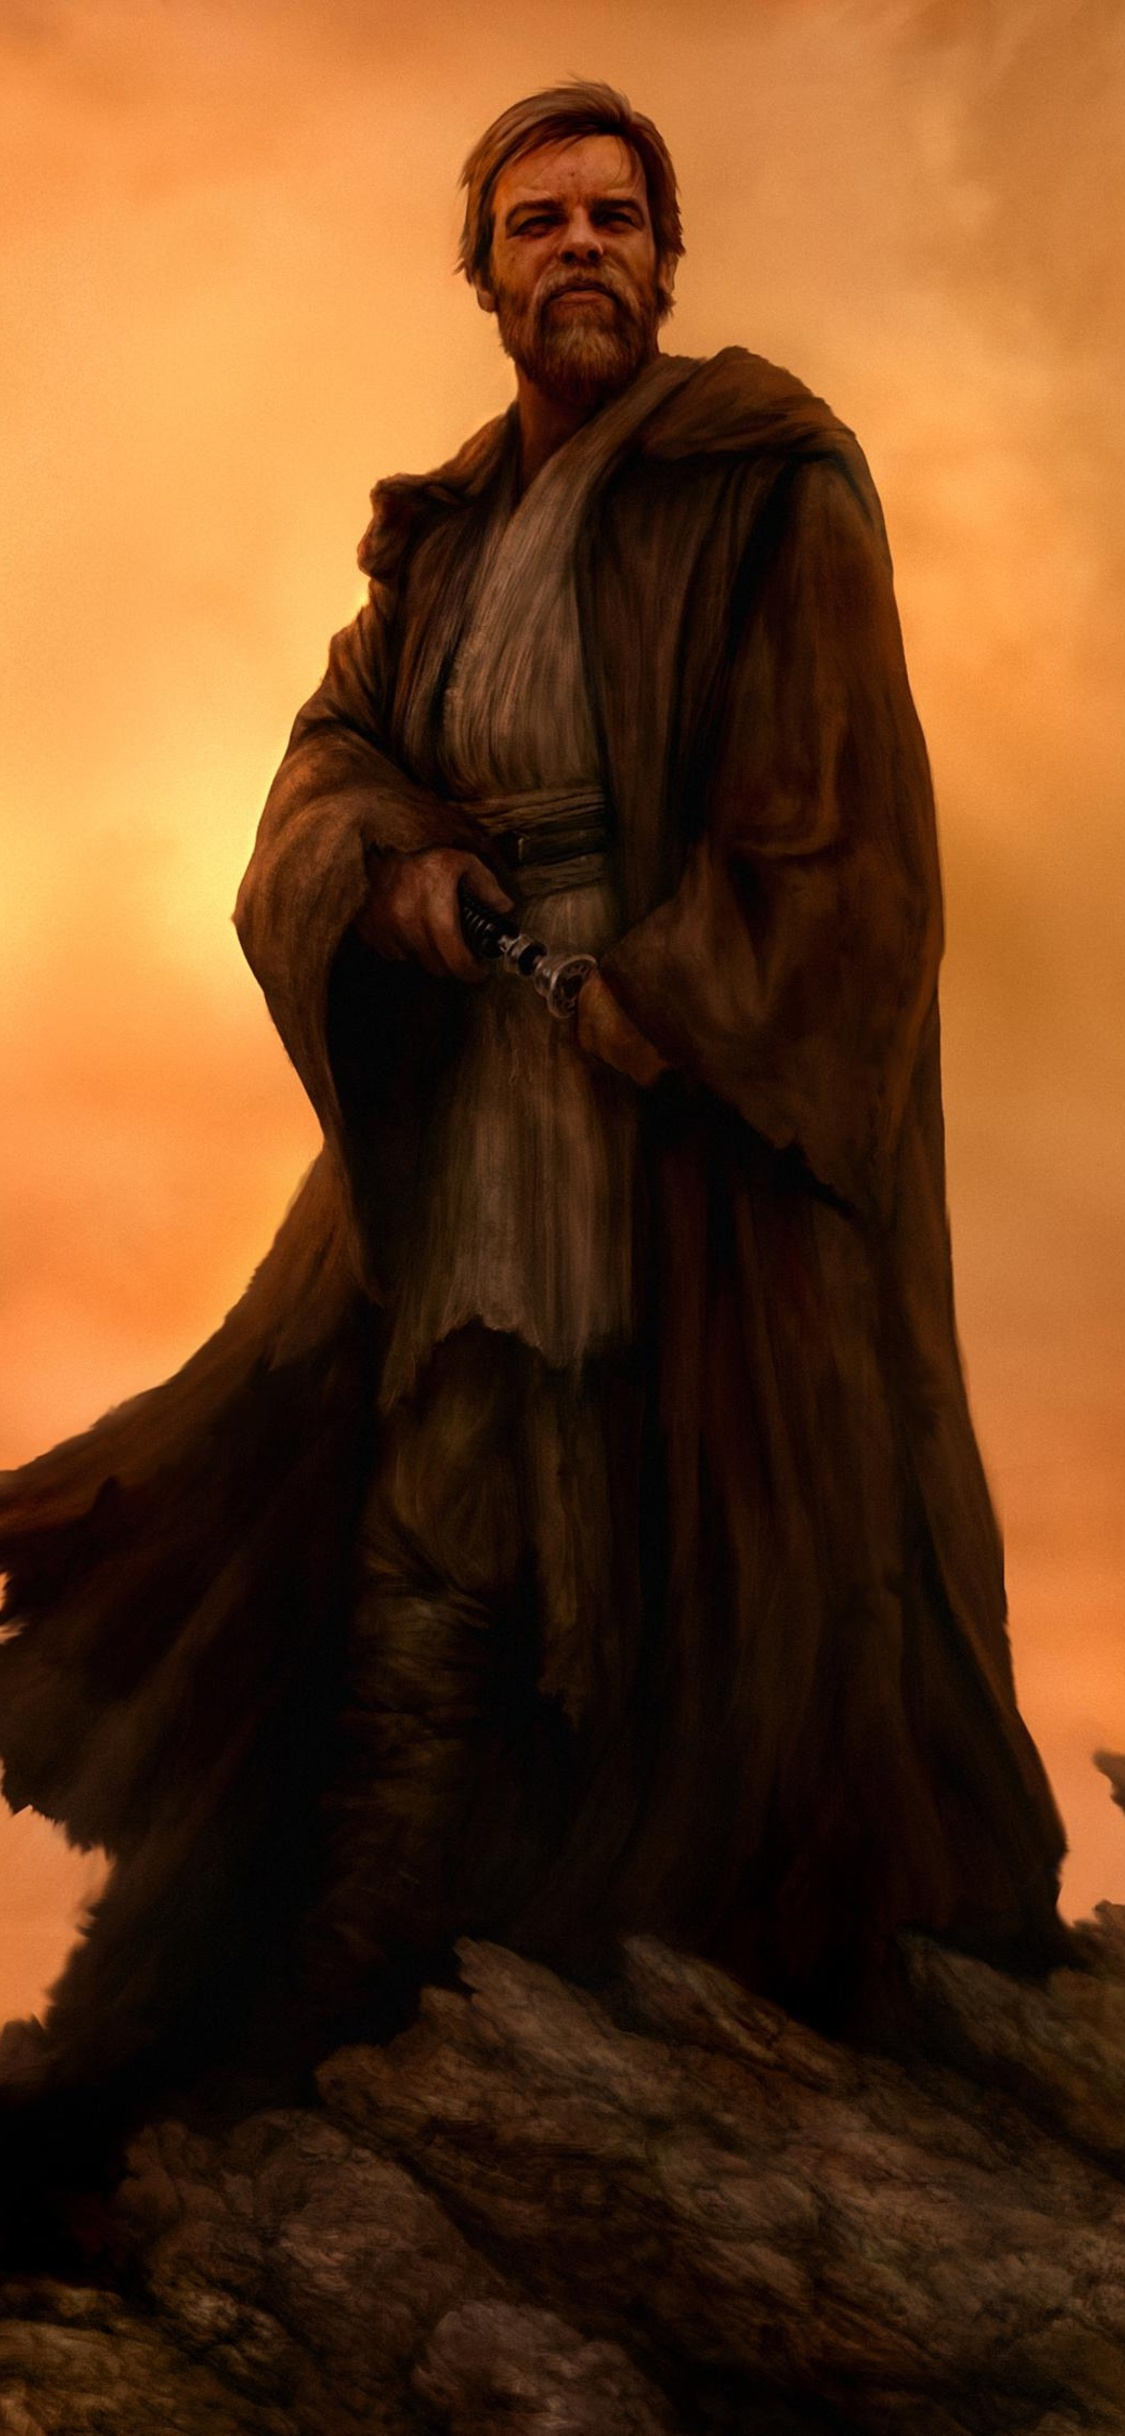 1125x2436 Obi Wan Kenobi Star Wars 4k Iphone Xs Iphone 10 Iphone X